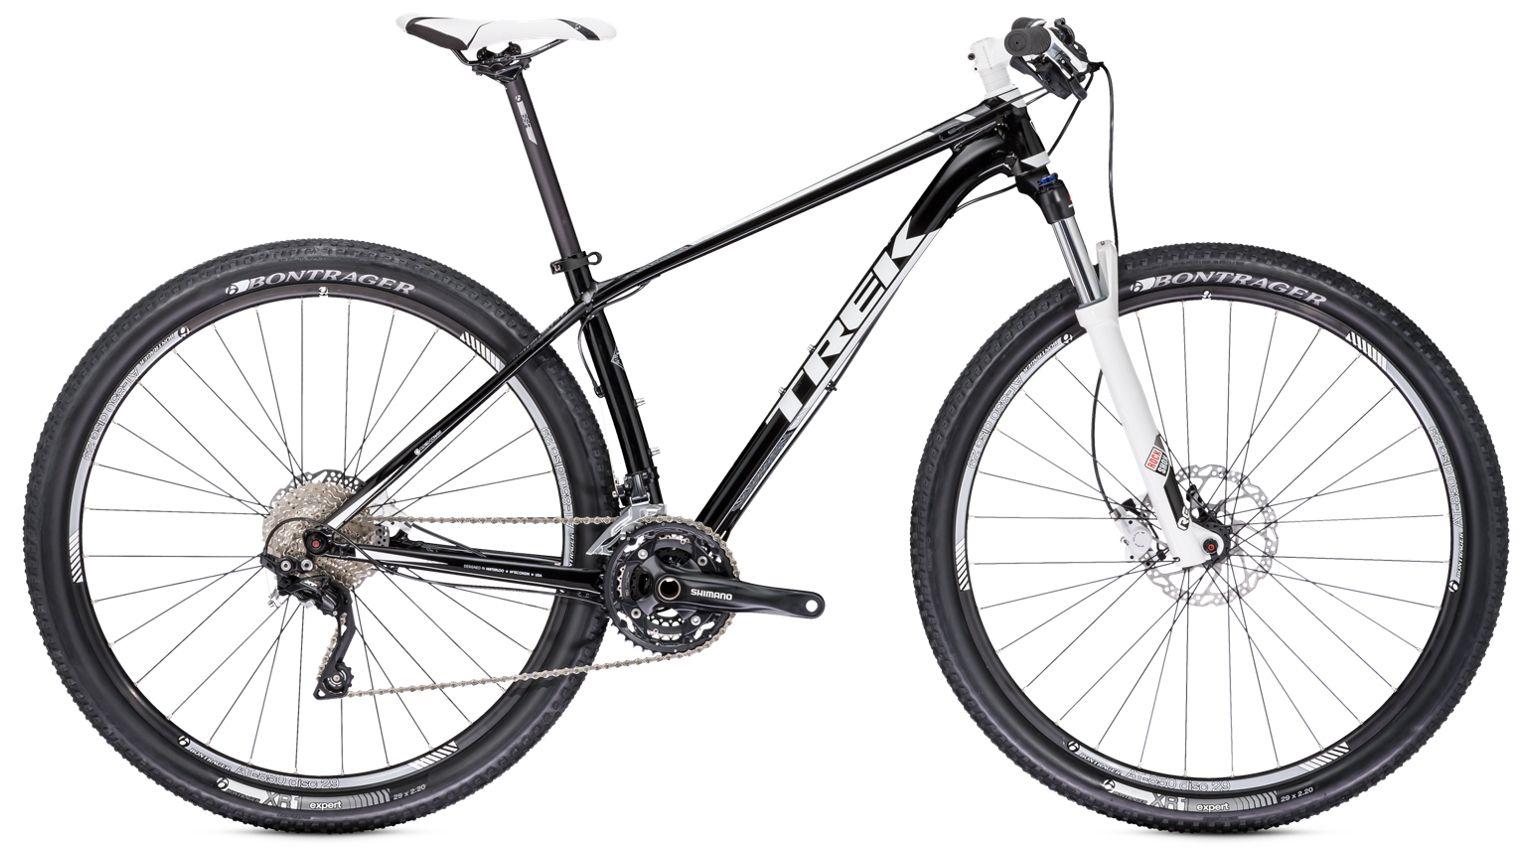 Велосипед Trek Superfly 5 2014,  Горные  - артикул:284030